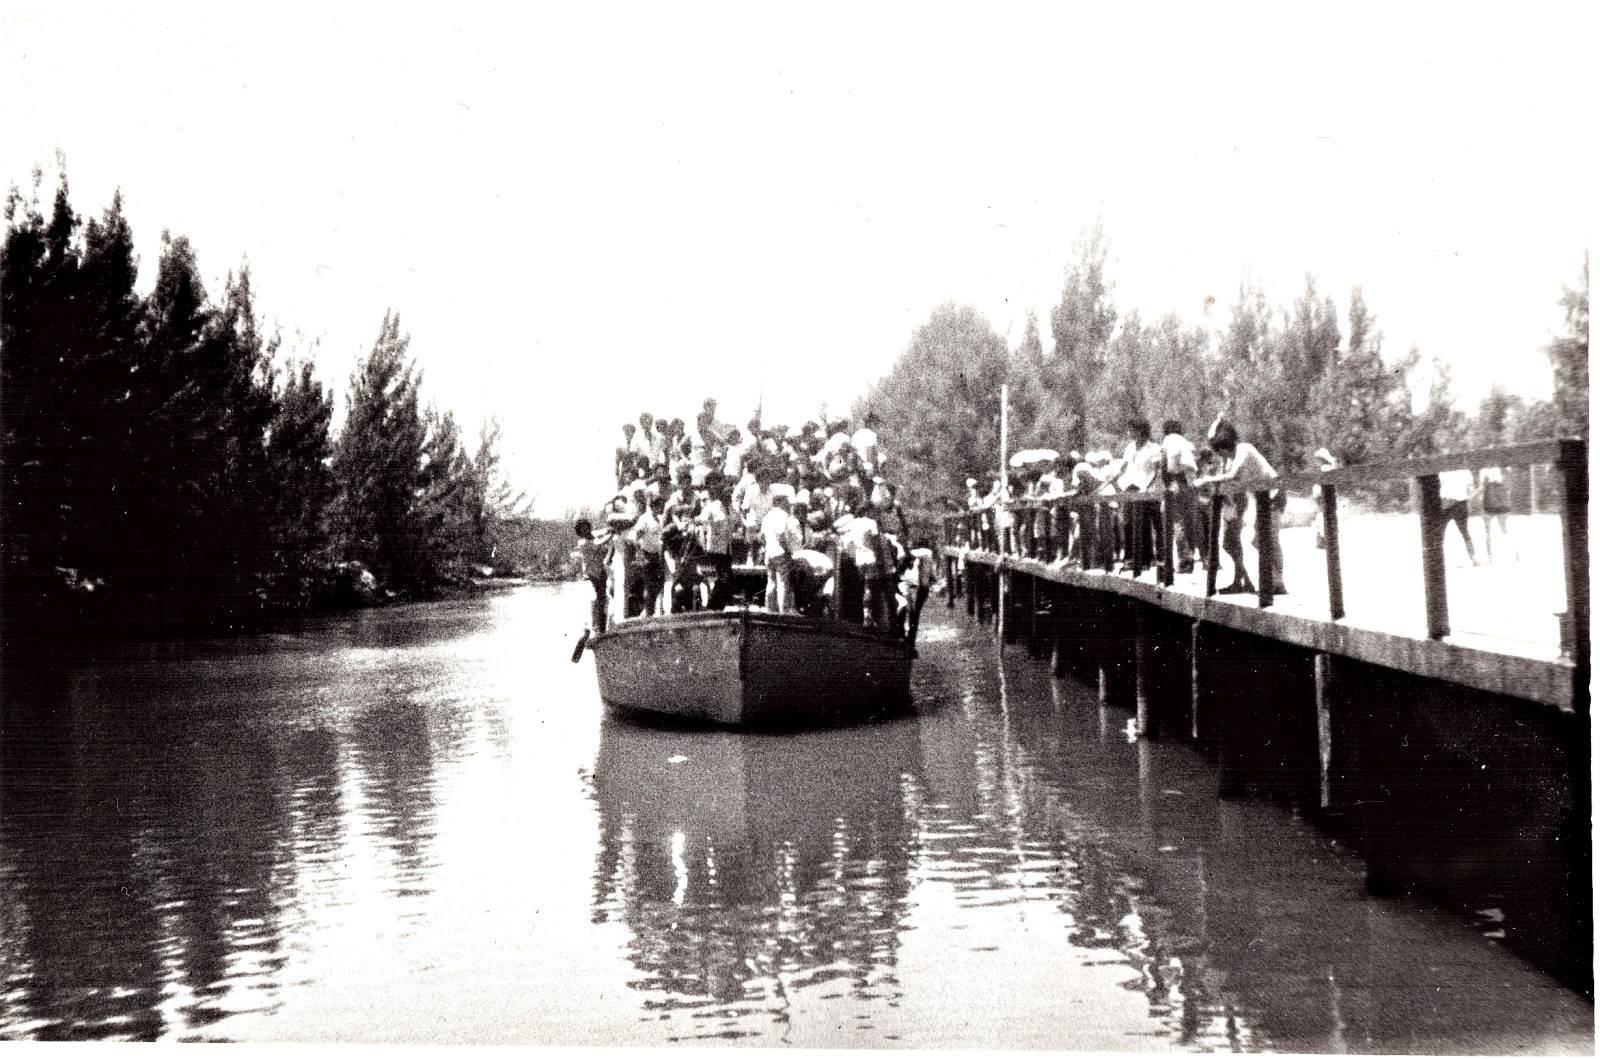 1987-1988. Остров Кайо Моа. Причал. 1 фото